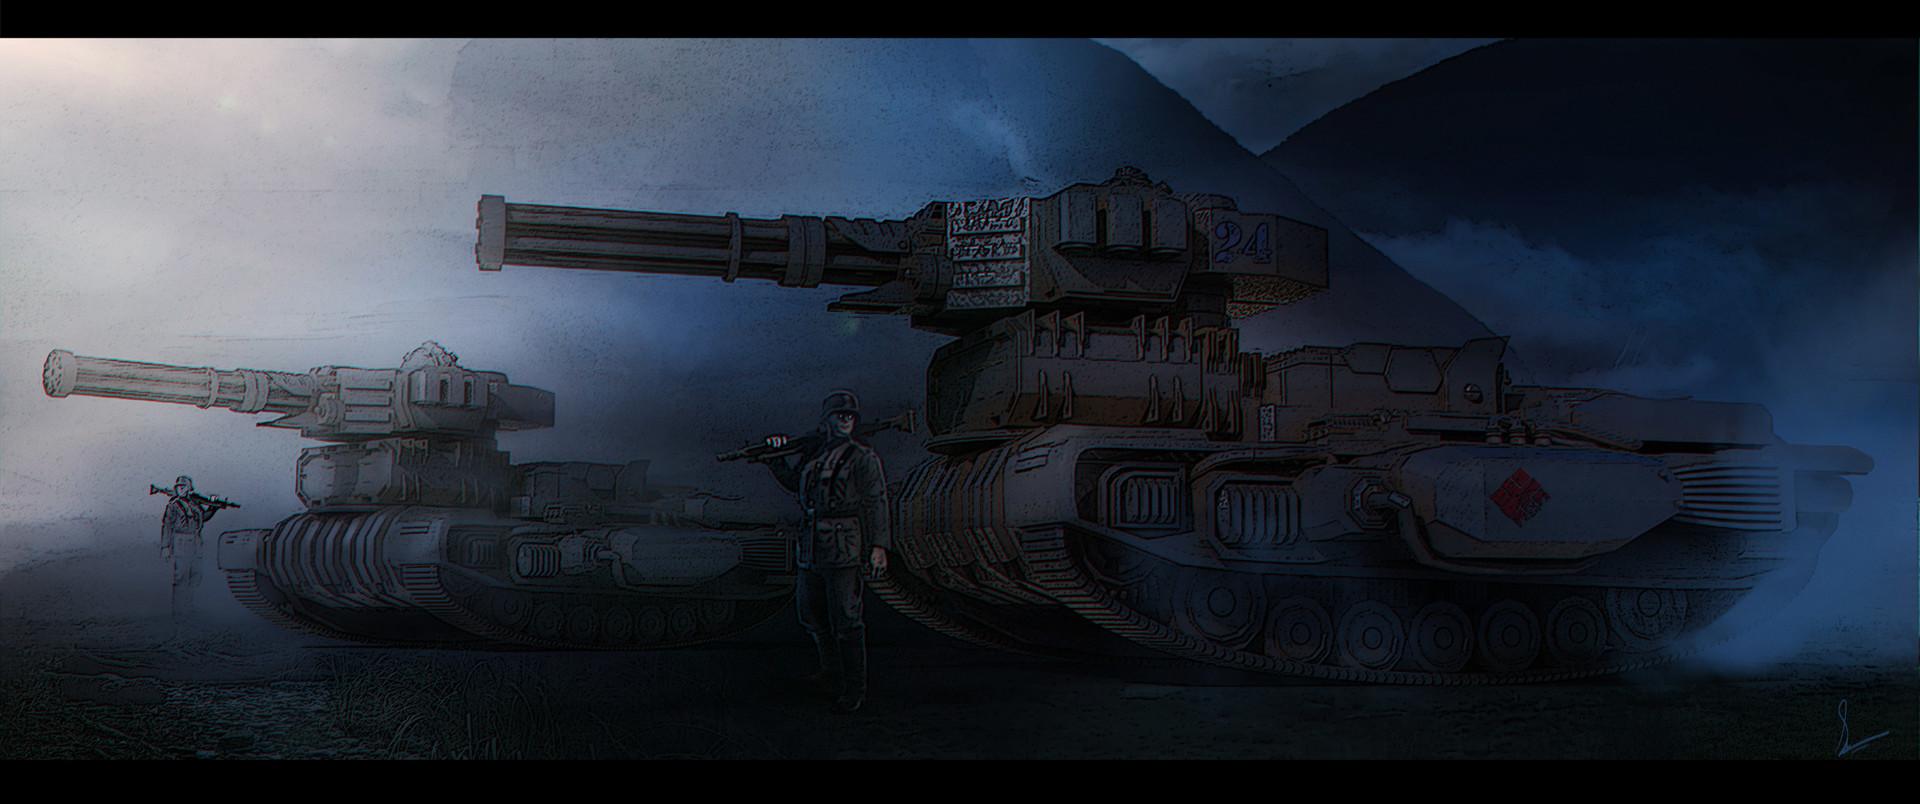 Shwetank shukla tank2